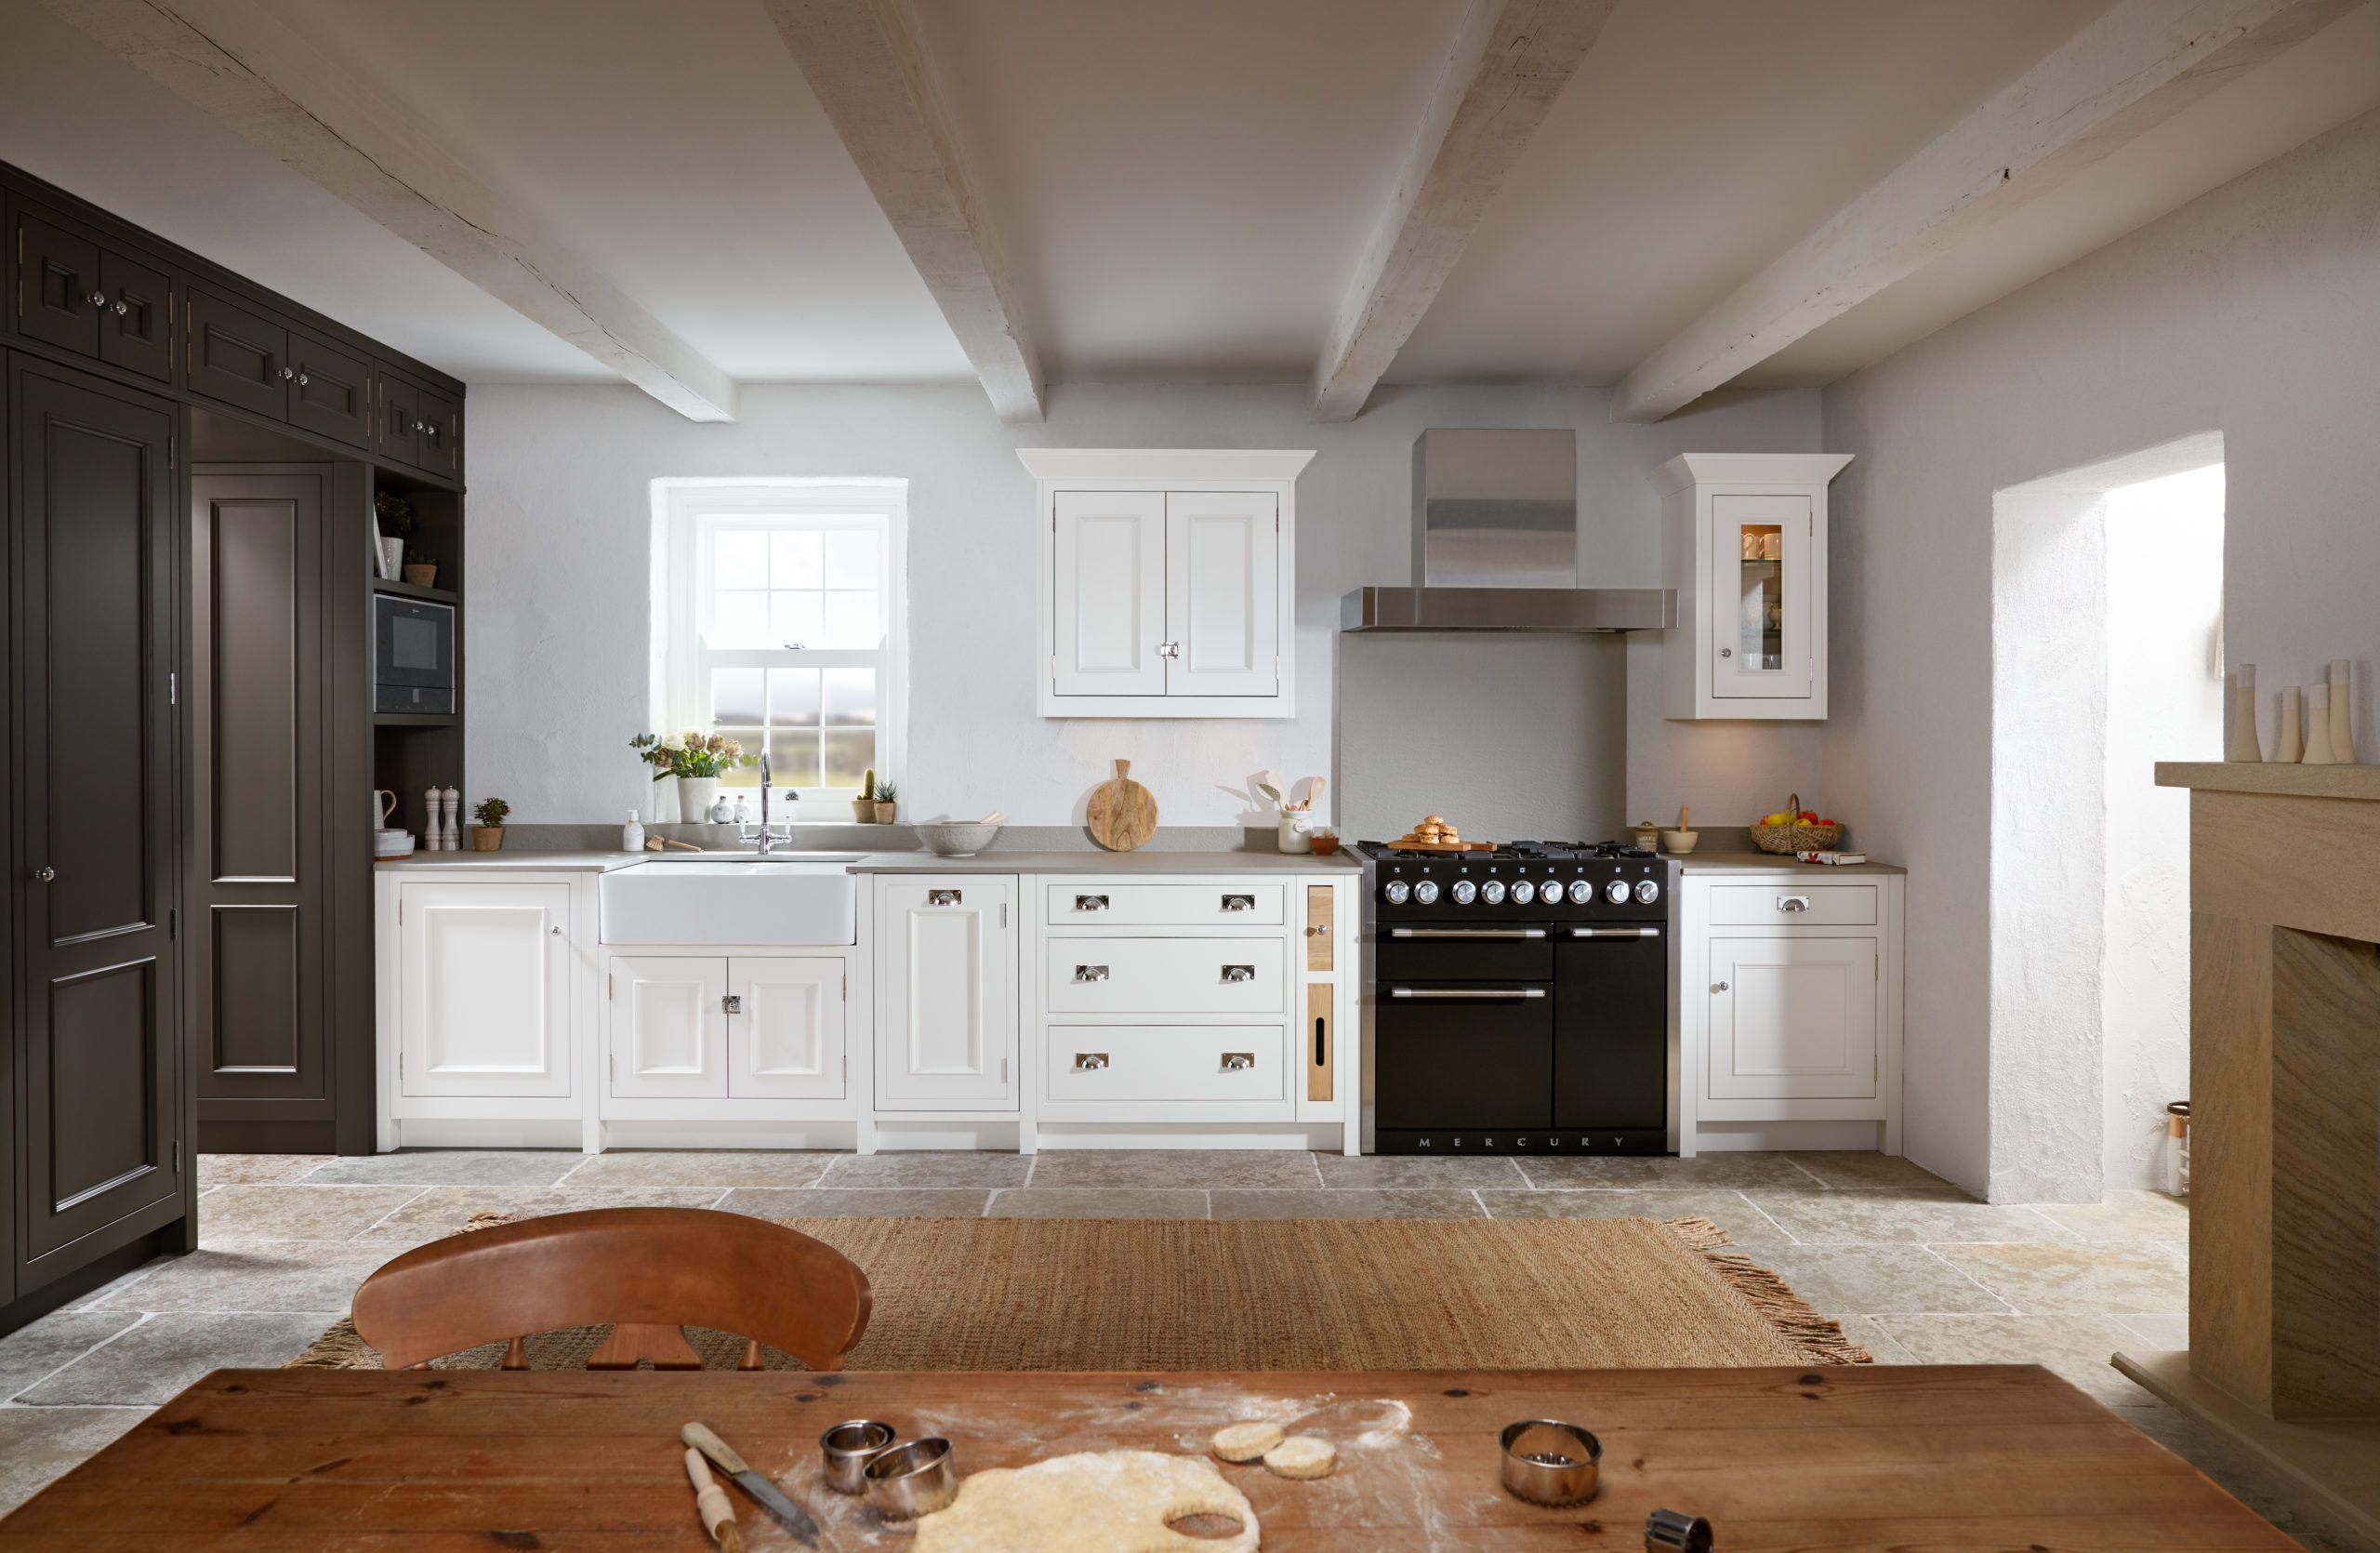 1909 Collection Elements Kitchen Design 1909 Kitchens In 2019